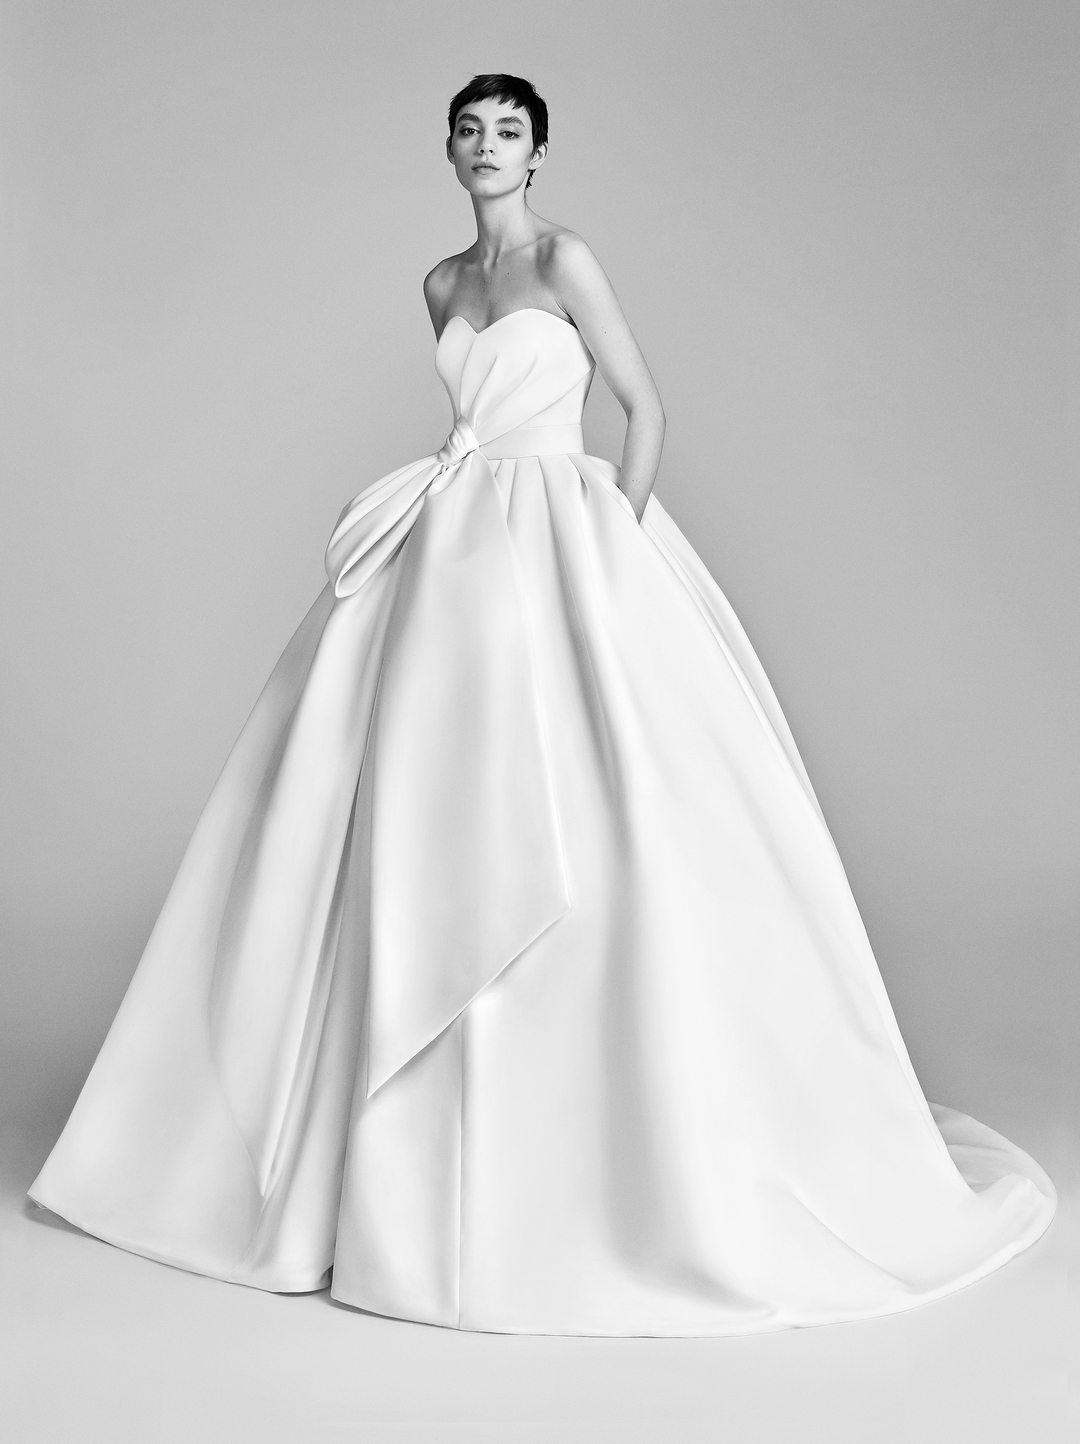 bow drape ballgown  dress photo